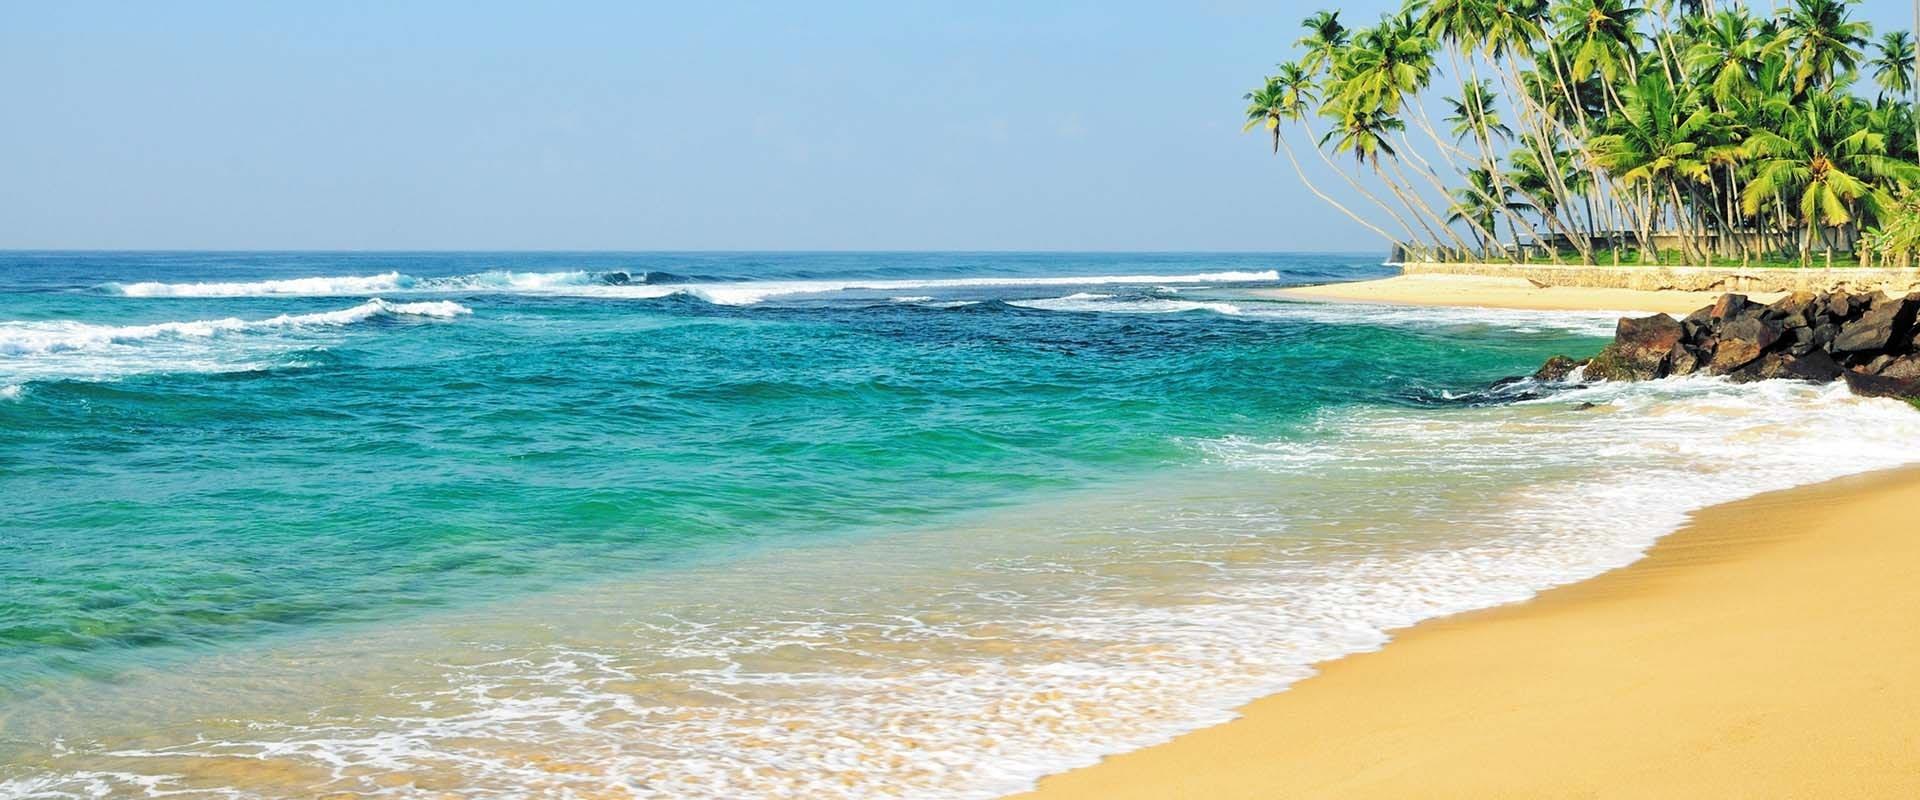 Sri Lanka Public Holidays 2020 - Publicholidays.lk 2020 Calendar Sri Lanka With Holidays